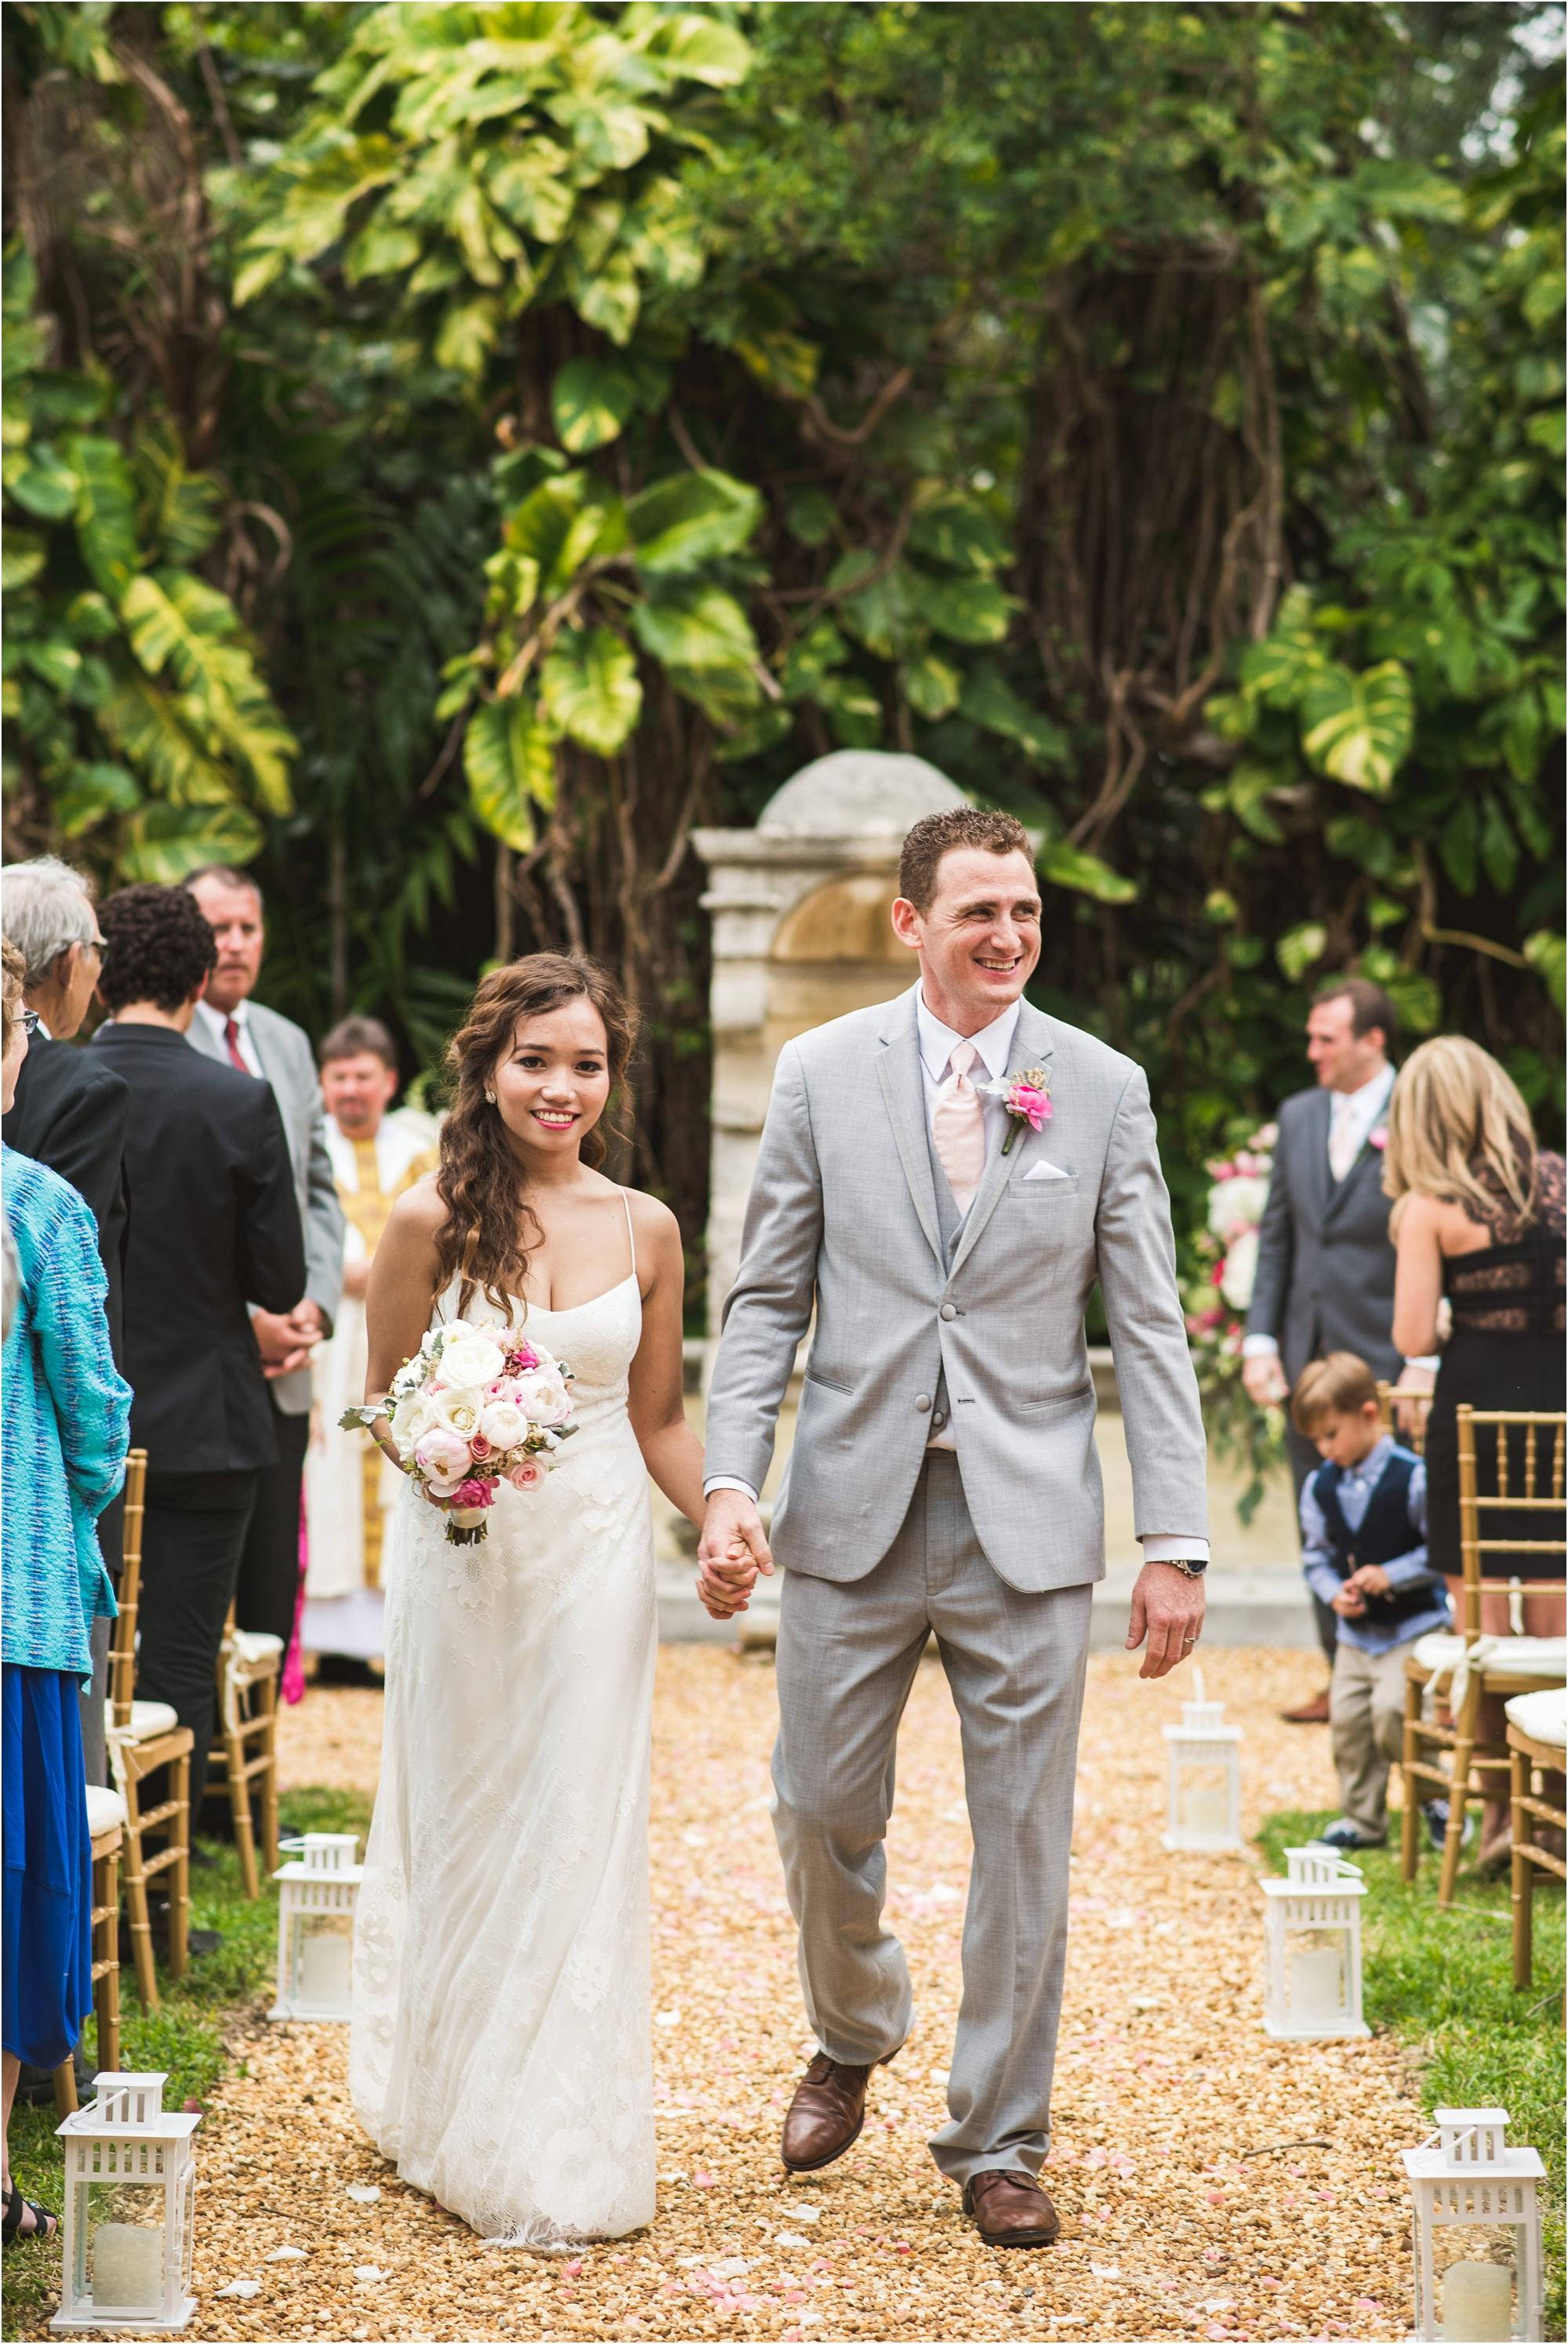 Spanish-Monastery-miami-beach-outdoor-elegant-wedding-photographer-jessenia-gonzalez_1177.jpg